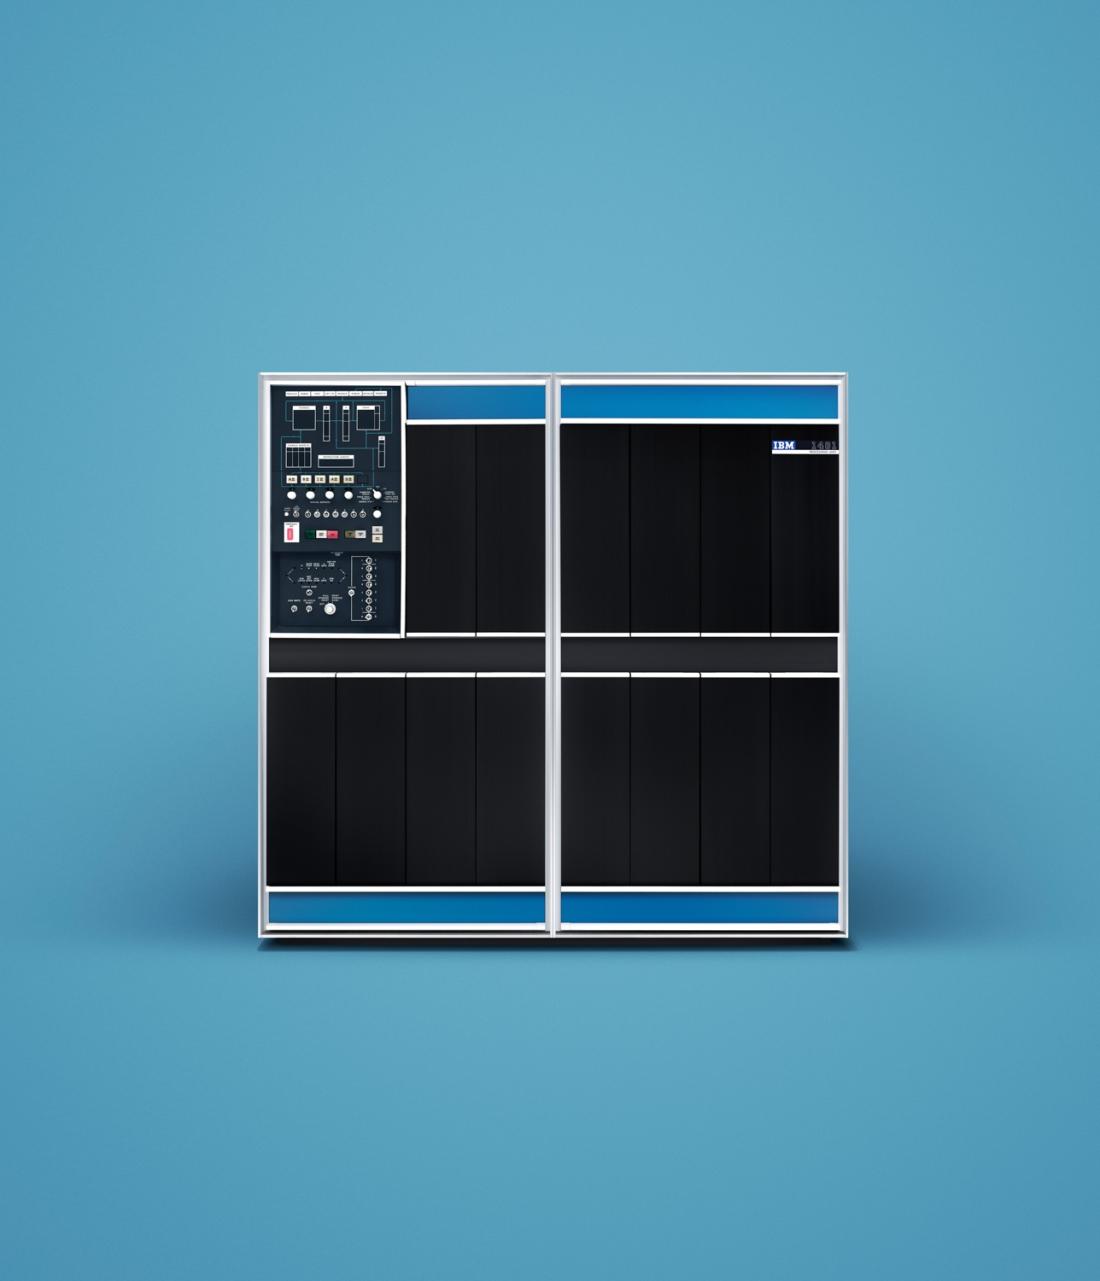 IBM_1401